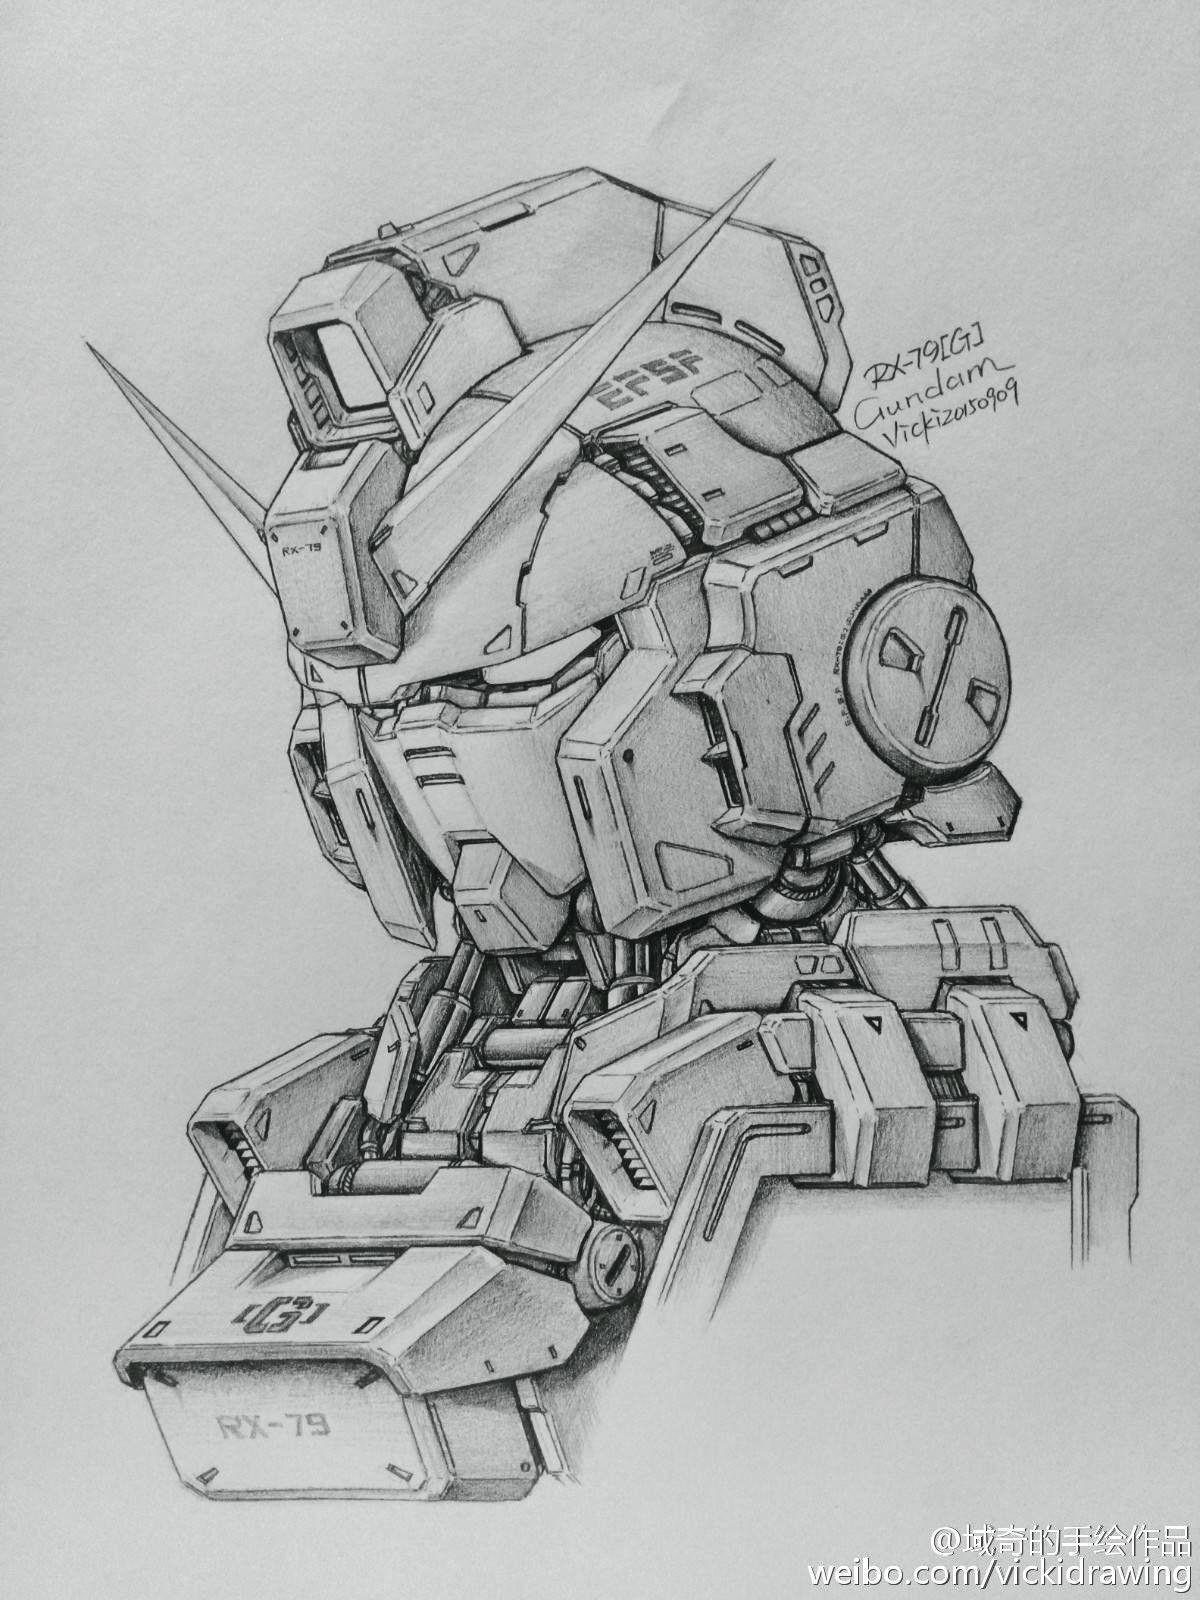 Gundam Guy Awesome Gundam Sketches By Vickidrawing Updated 9 22 15